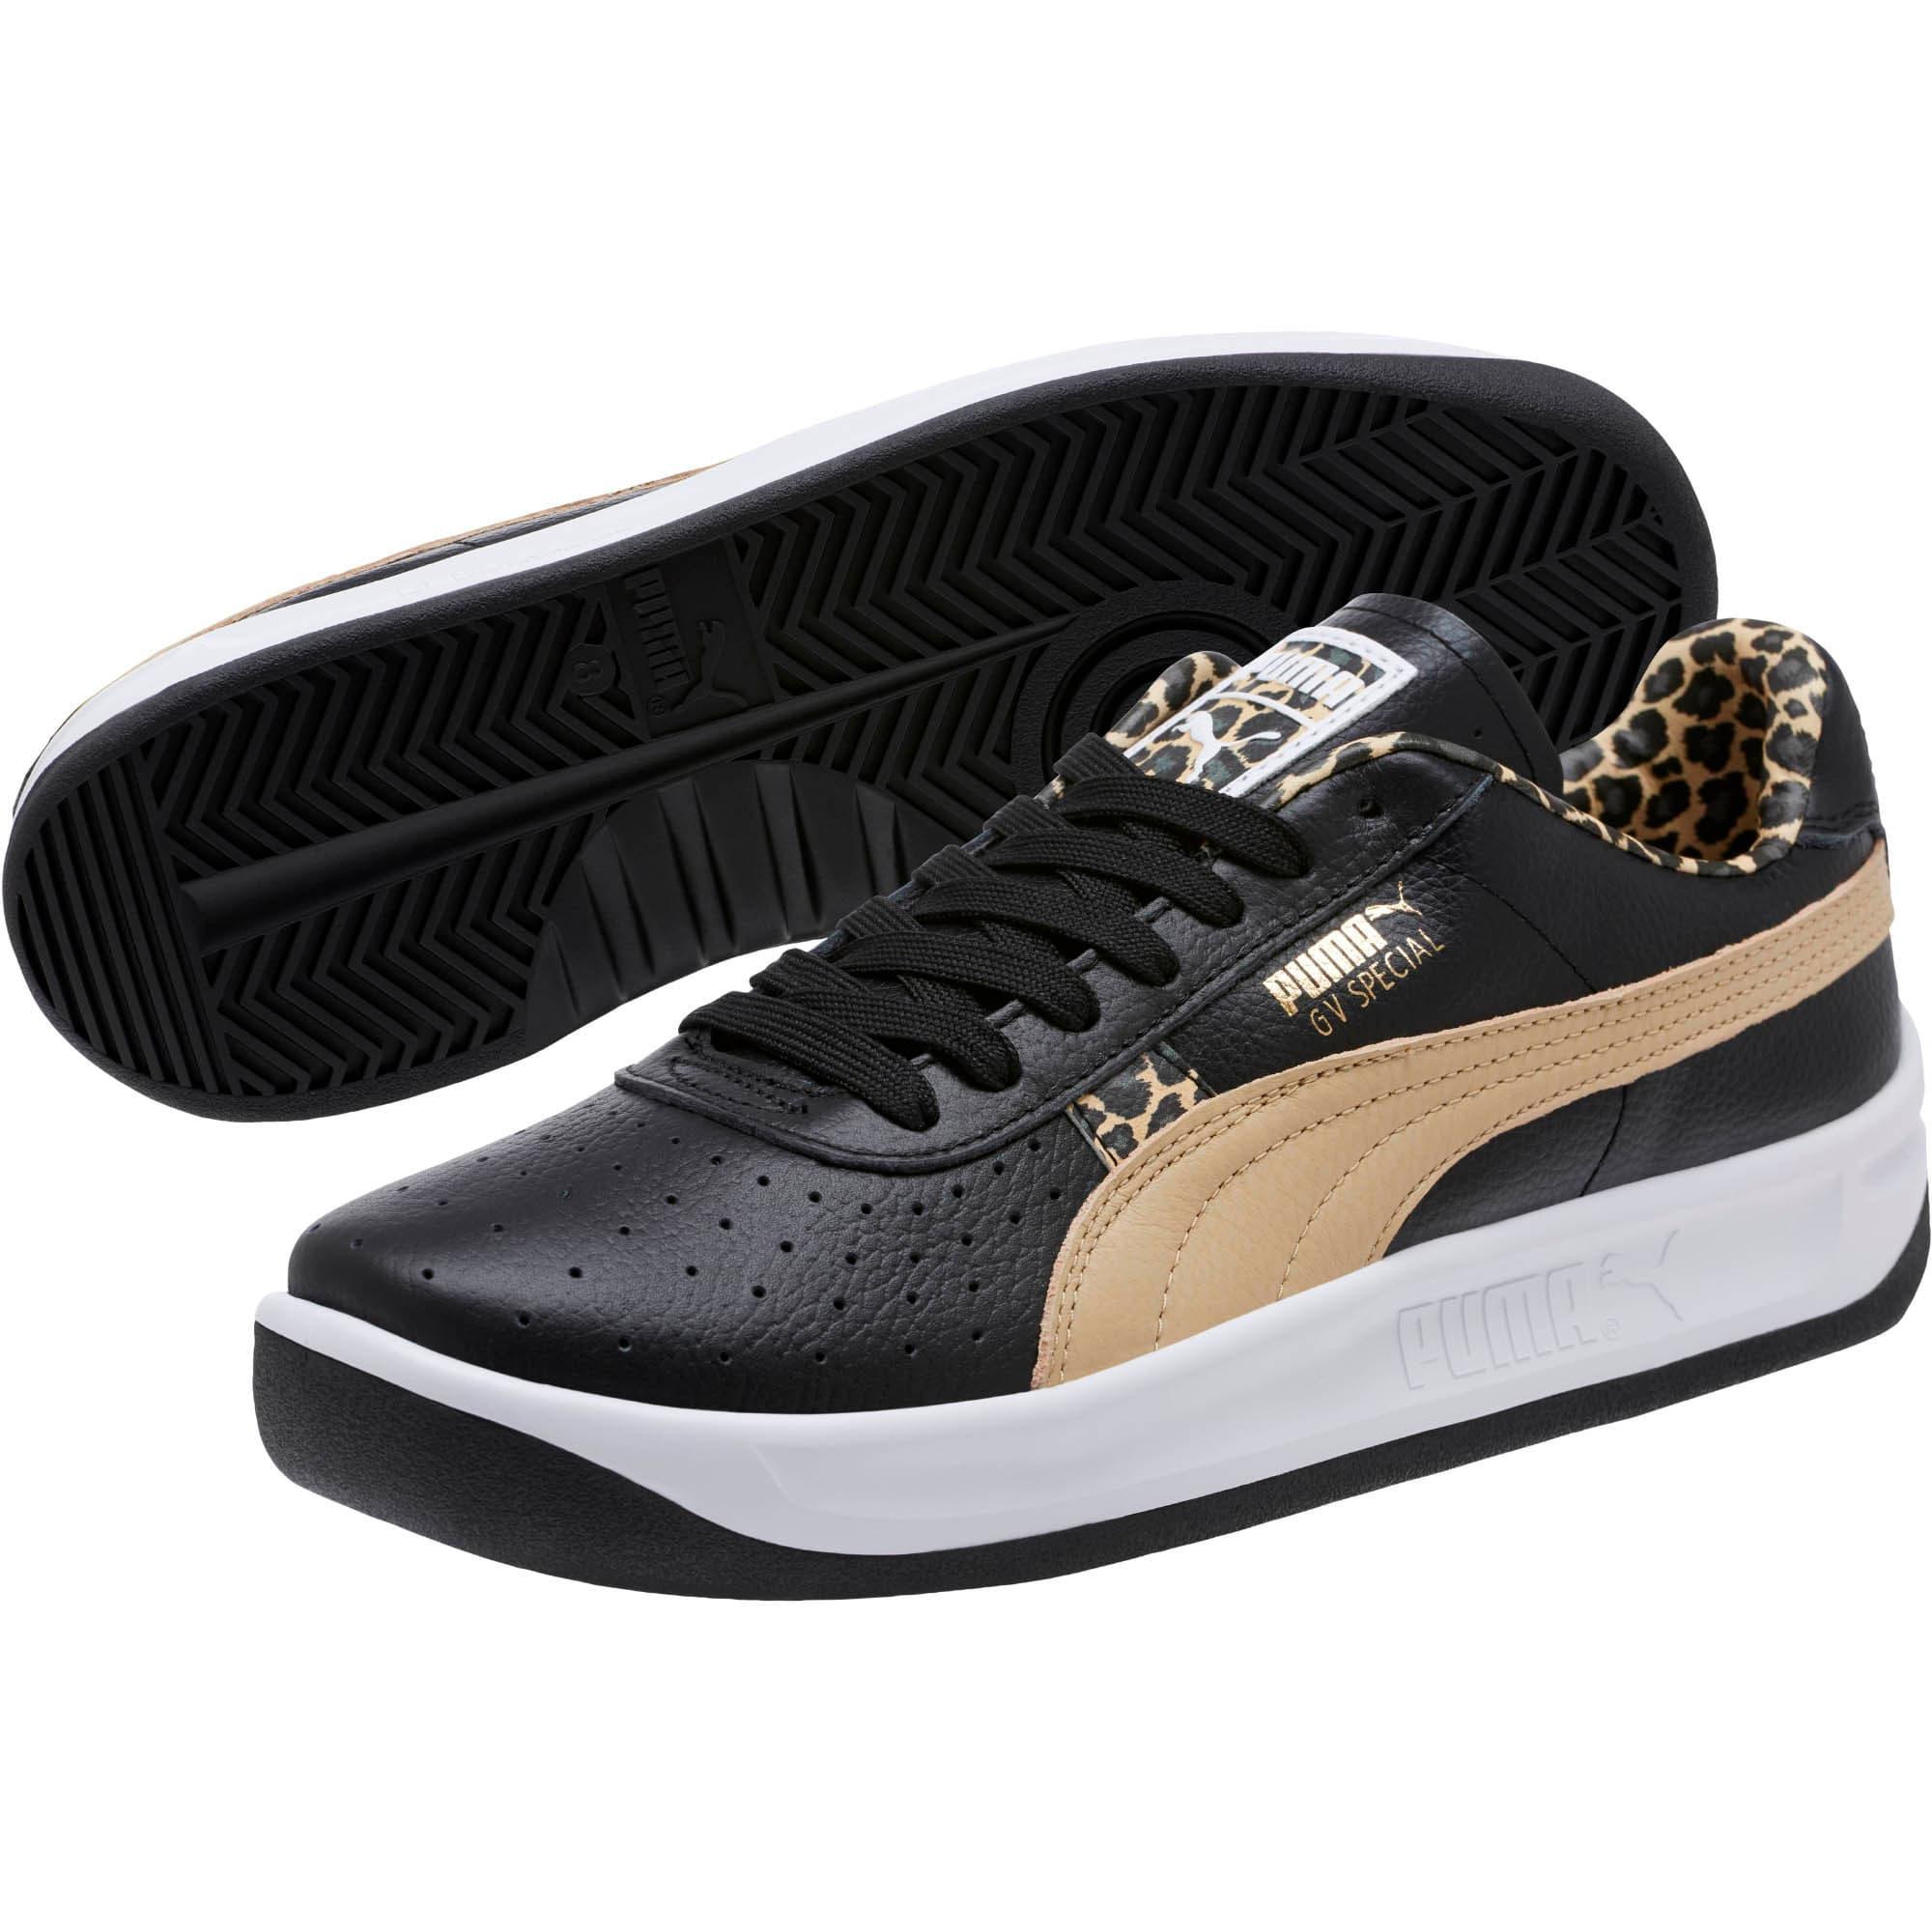 Thumbnail 2 of GV Special Wild Sneakers, Black-Pebble-Puma Team Gold, medium